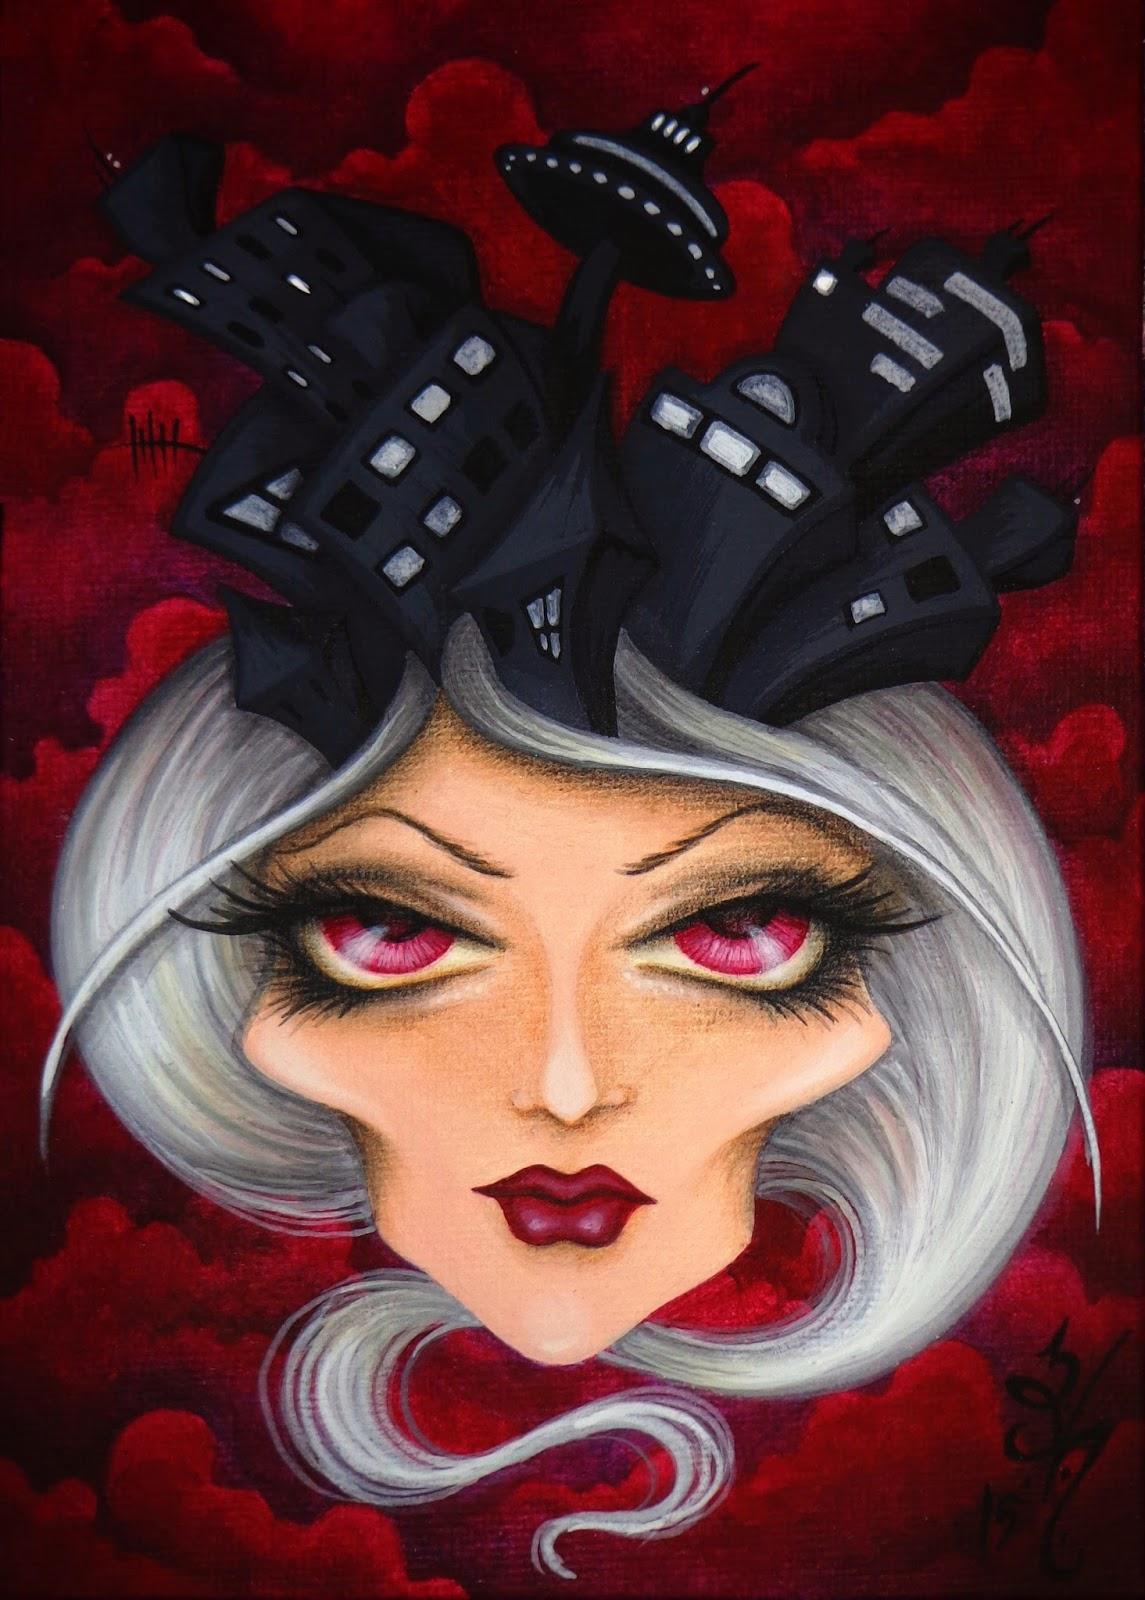 https://www.etsy.com/listing/217775774/8x10-print-fantasy-lowbrow-woman-face